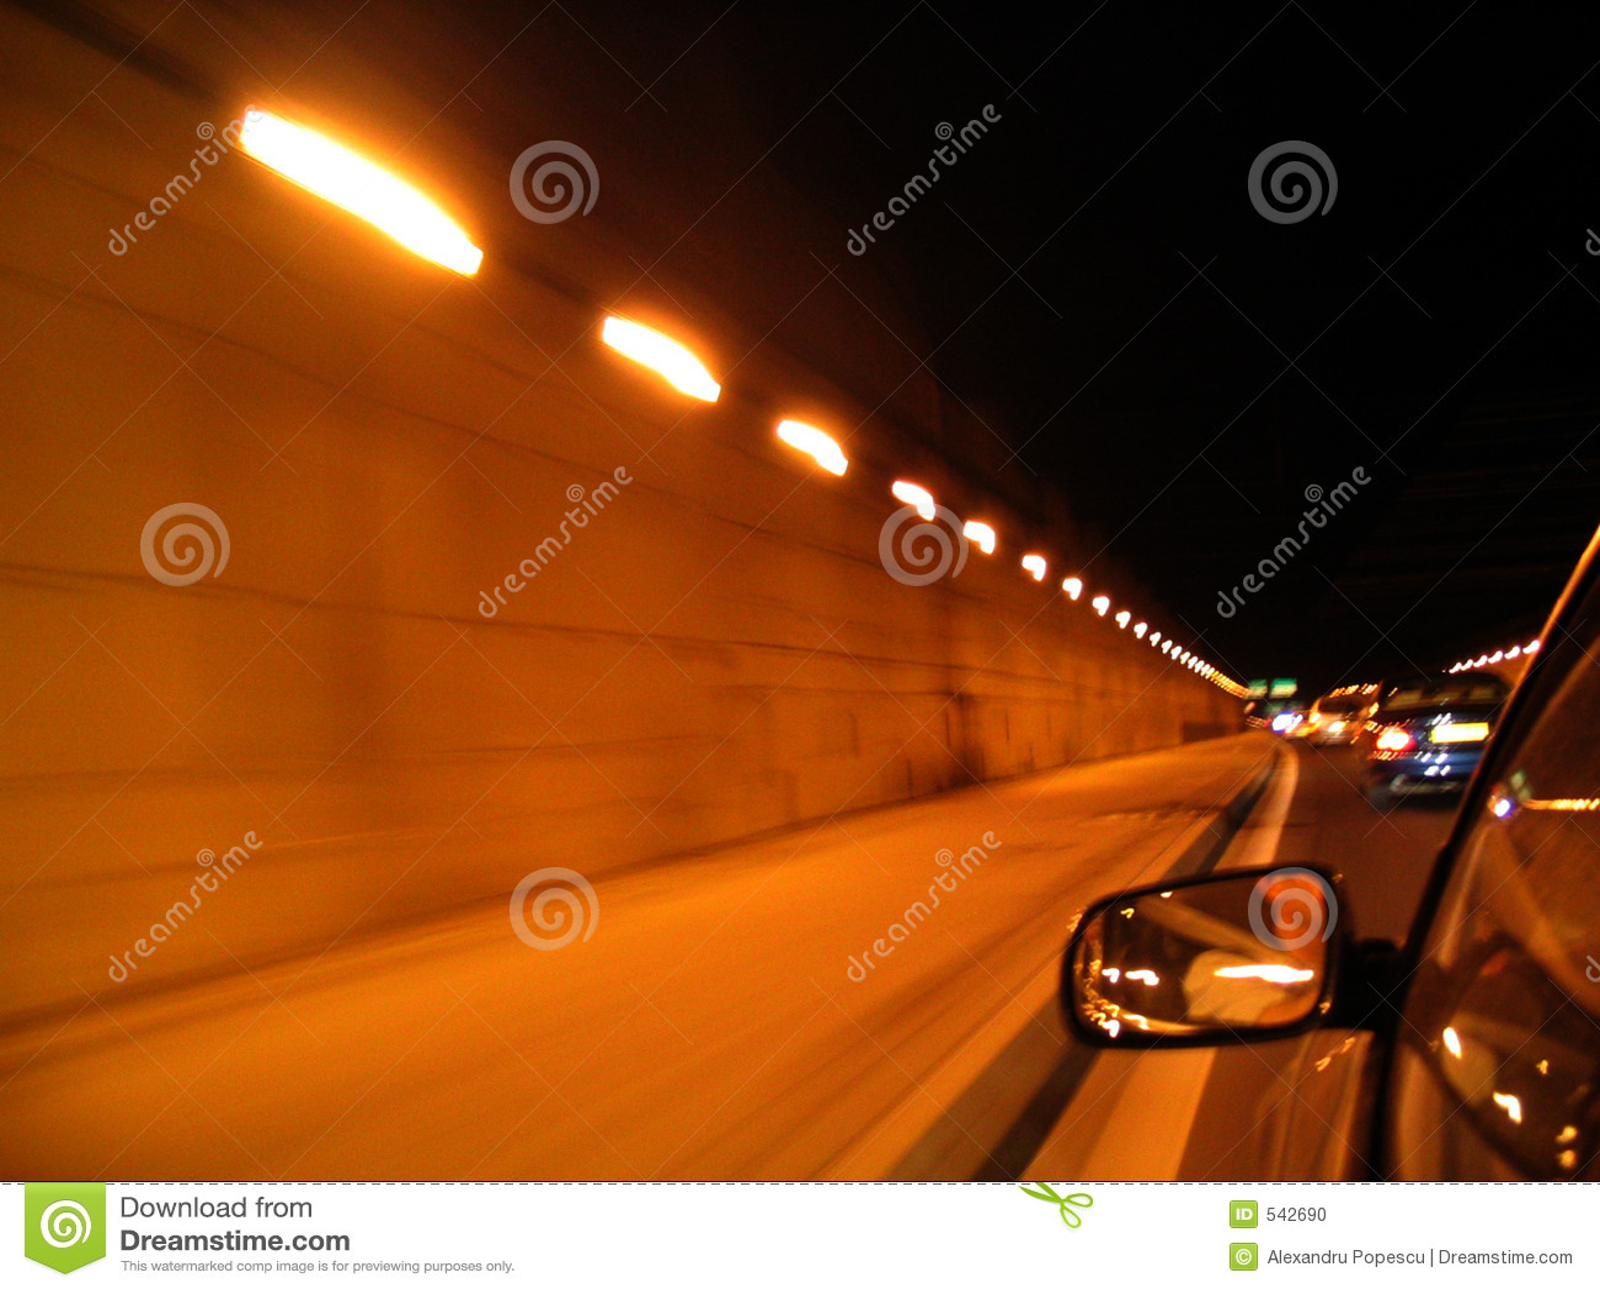 Download 汽车 库存照片. 图片 包括有 假期, 大众, 汽车, 高速公路, 业务量, 运输, 快速, 驱动, 下面, 玻璃 - 542690